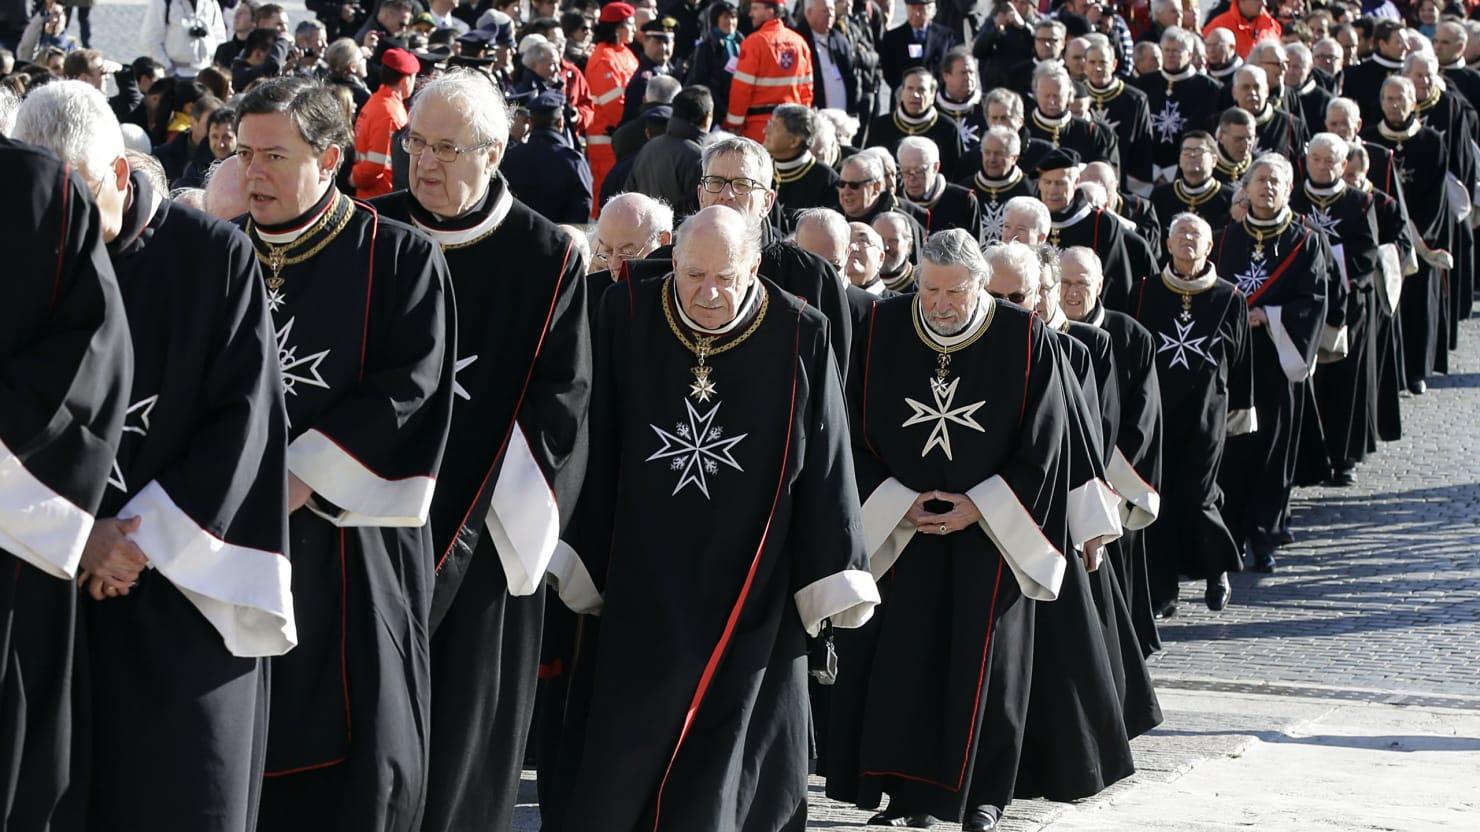 Knights of Malta Celebrates 900th Birthday  The Daily Beast